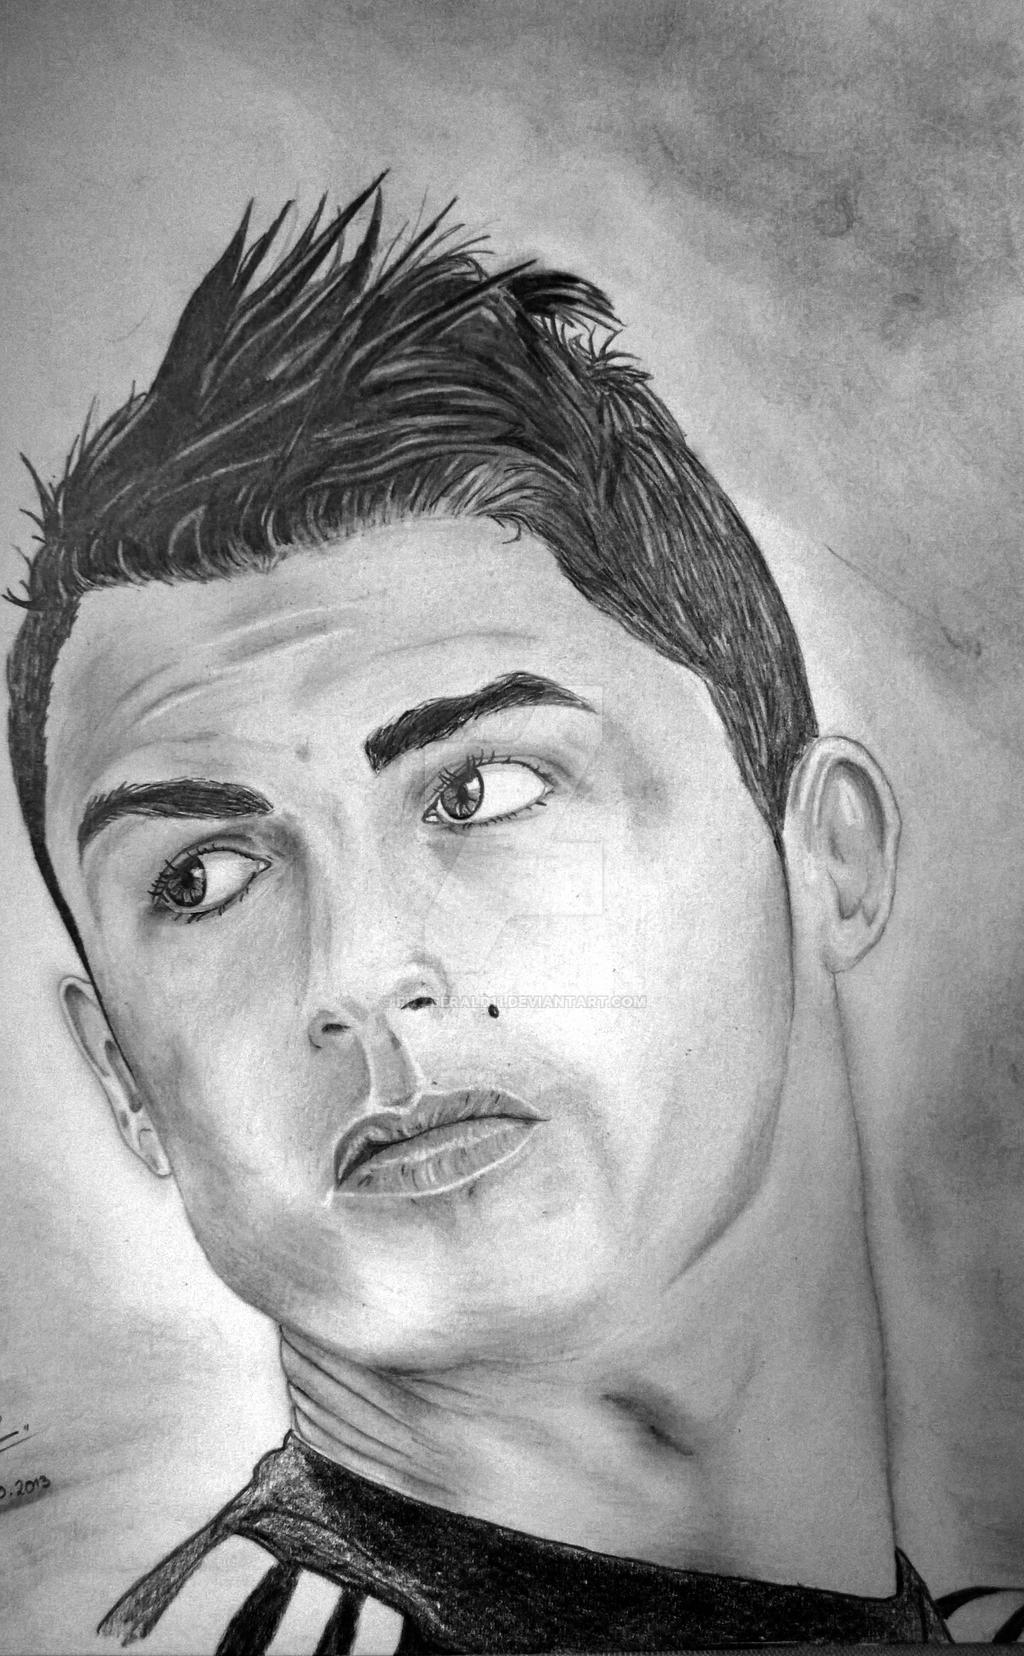 Cristiano Ronaldo by Fitzgerald11 on DeviantArt